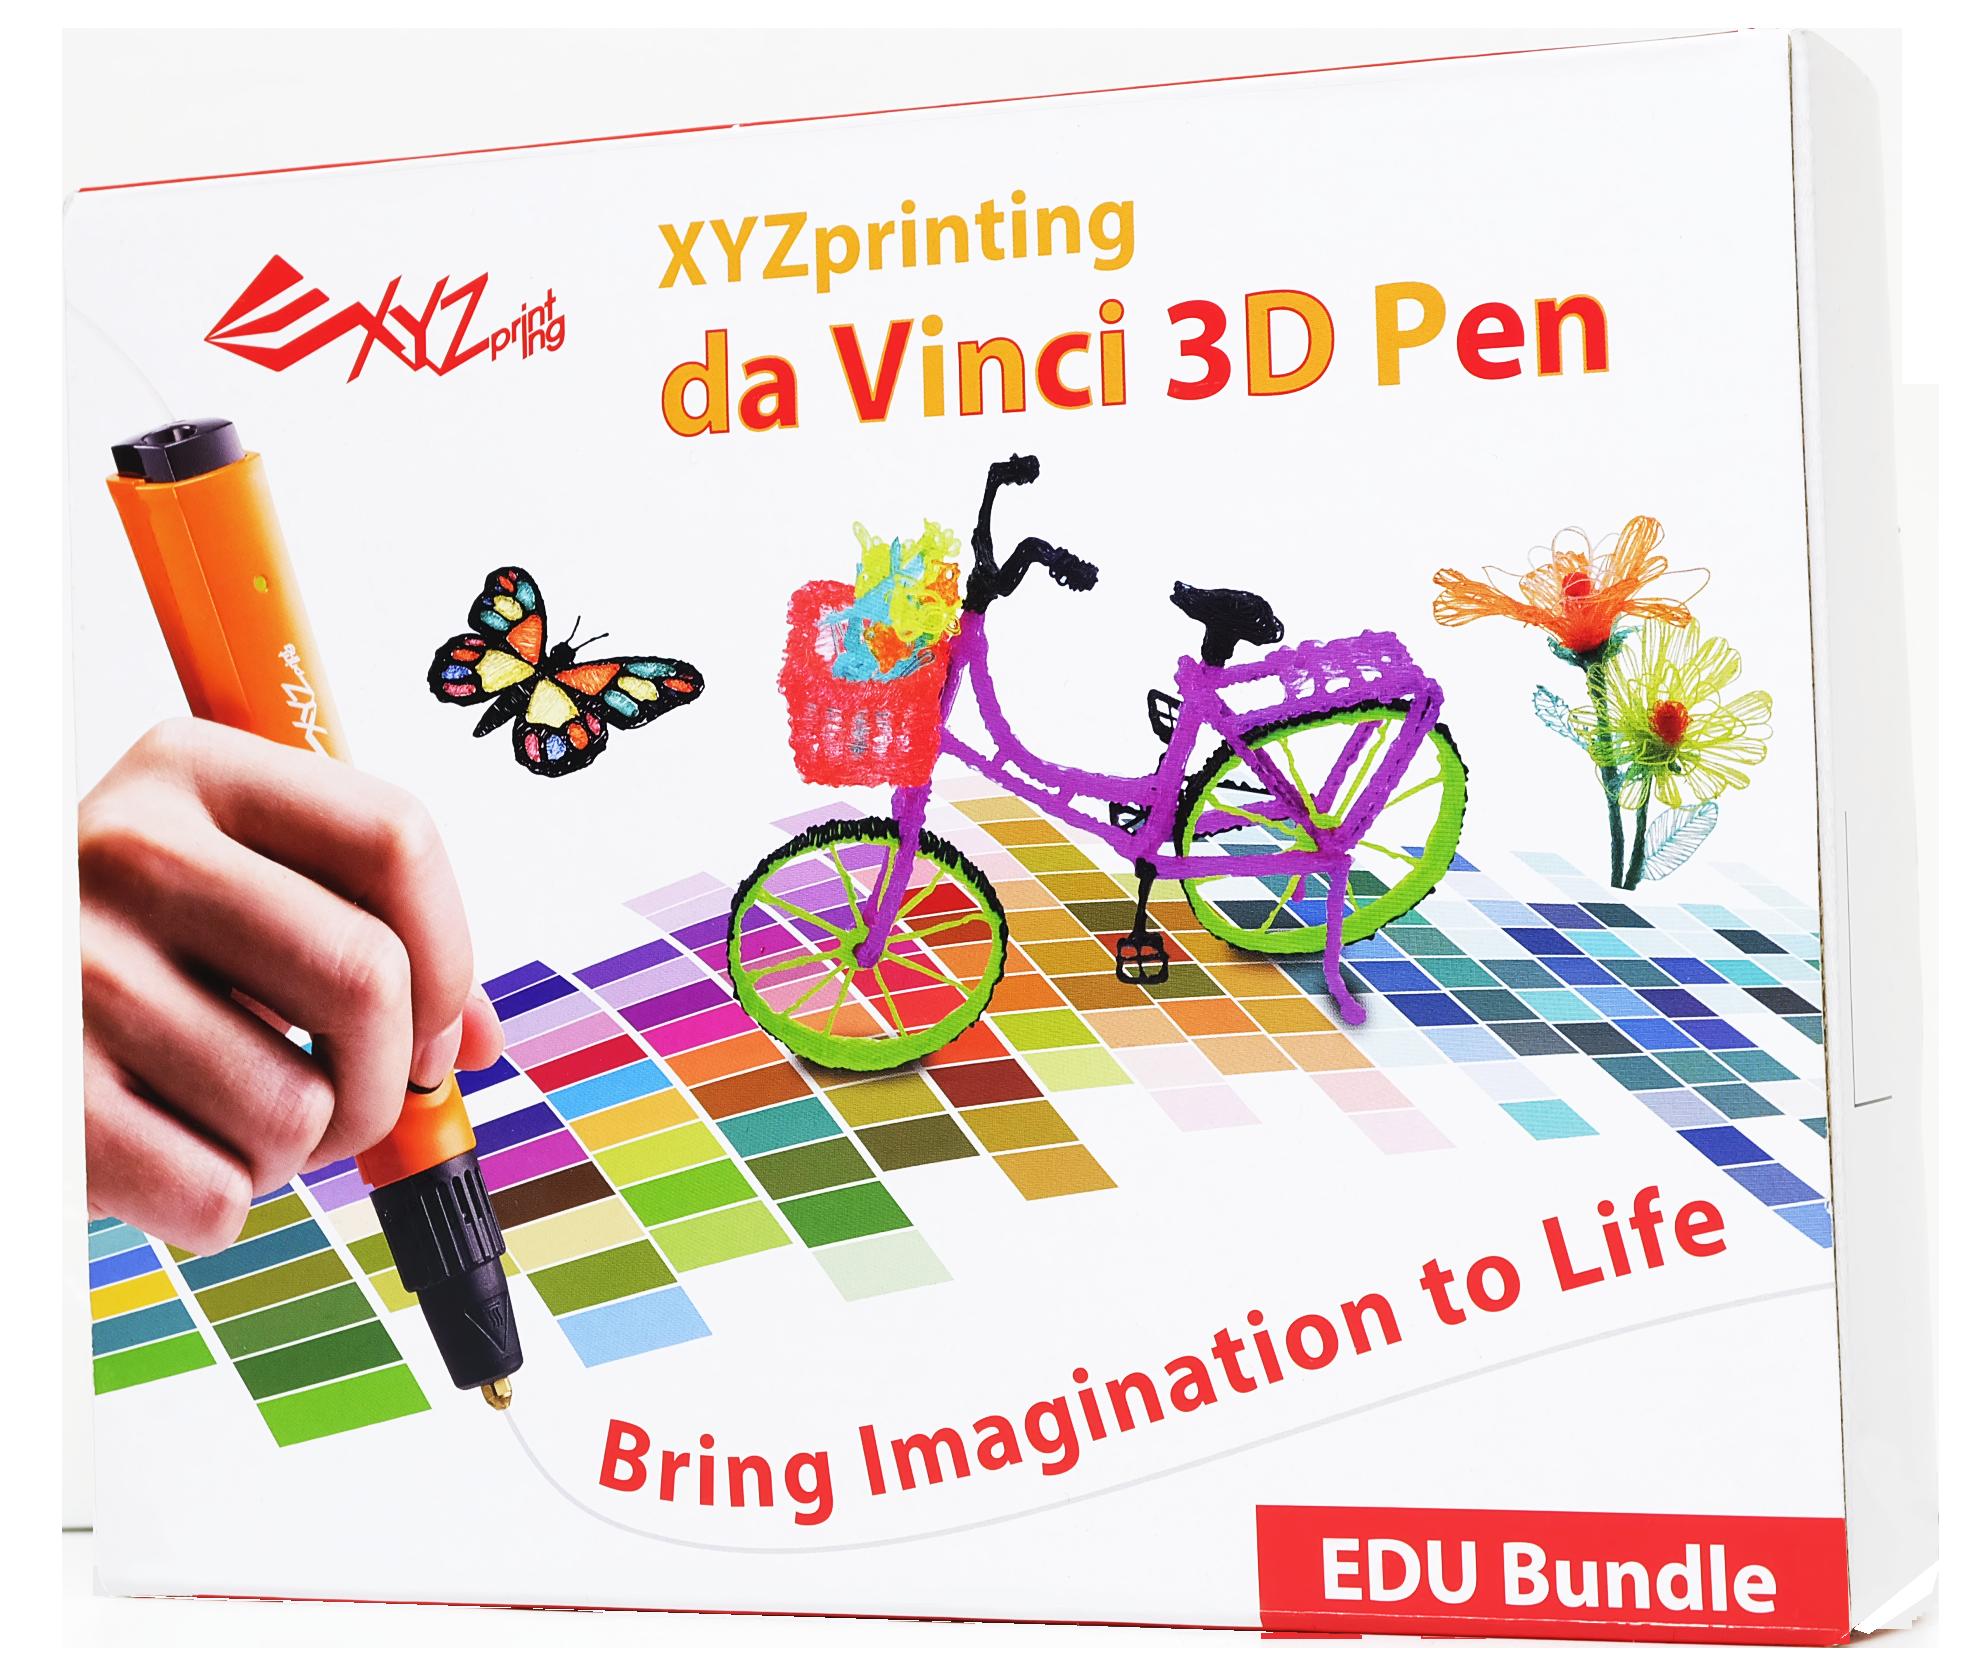 da vinci 3d pen education package - XYZprinting präsentiert neue 3D-Drucker auf CES 2017 - Update